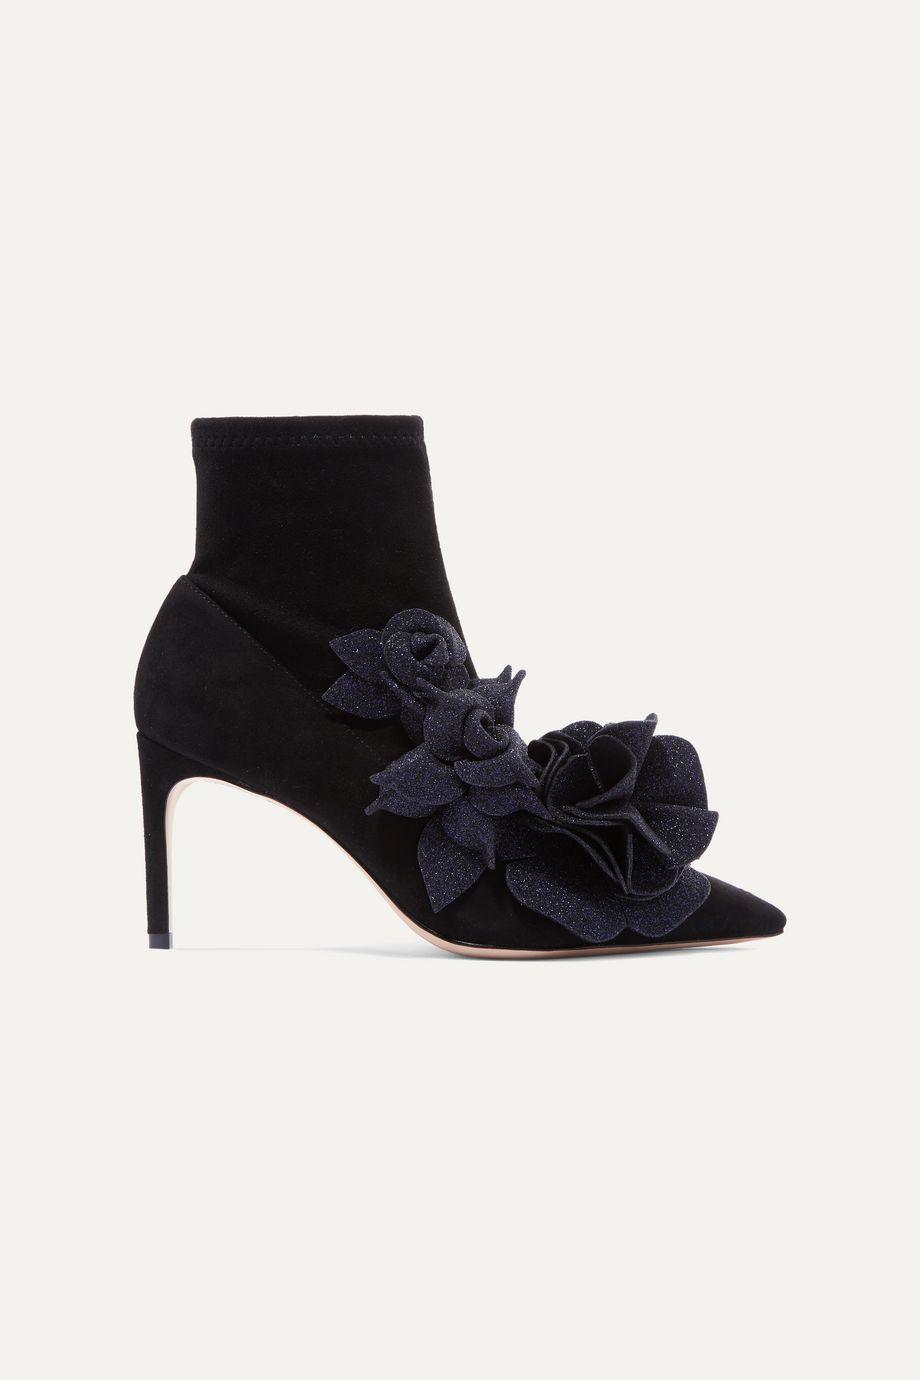 Sophia Webster Jumbo Lilico 贴花绒面革踝靴